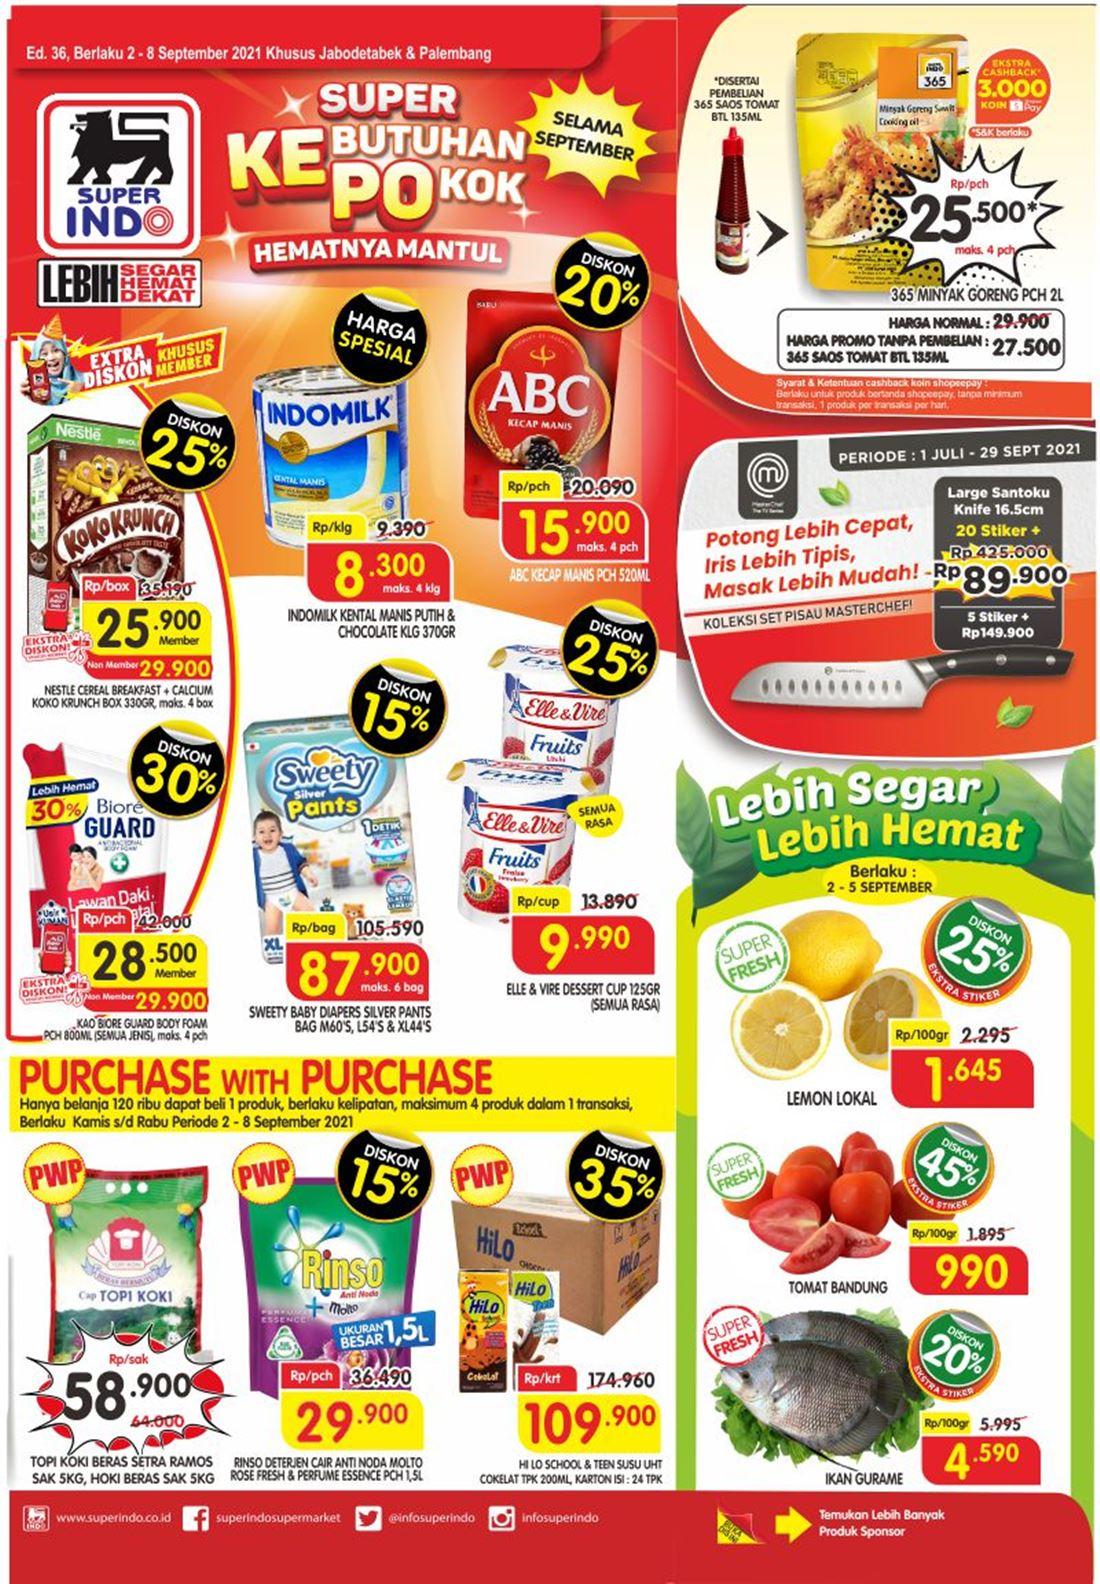 Katalog Superindo Promo Superindo Mingguan 02 - 08 September 2021